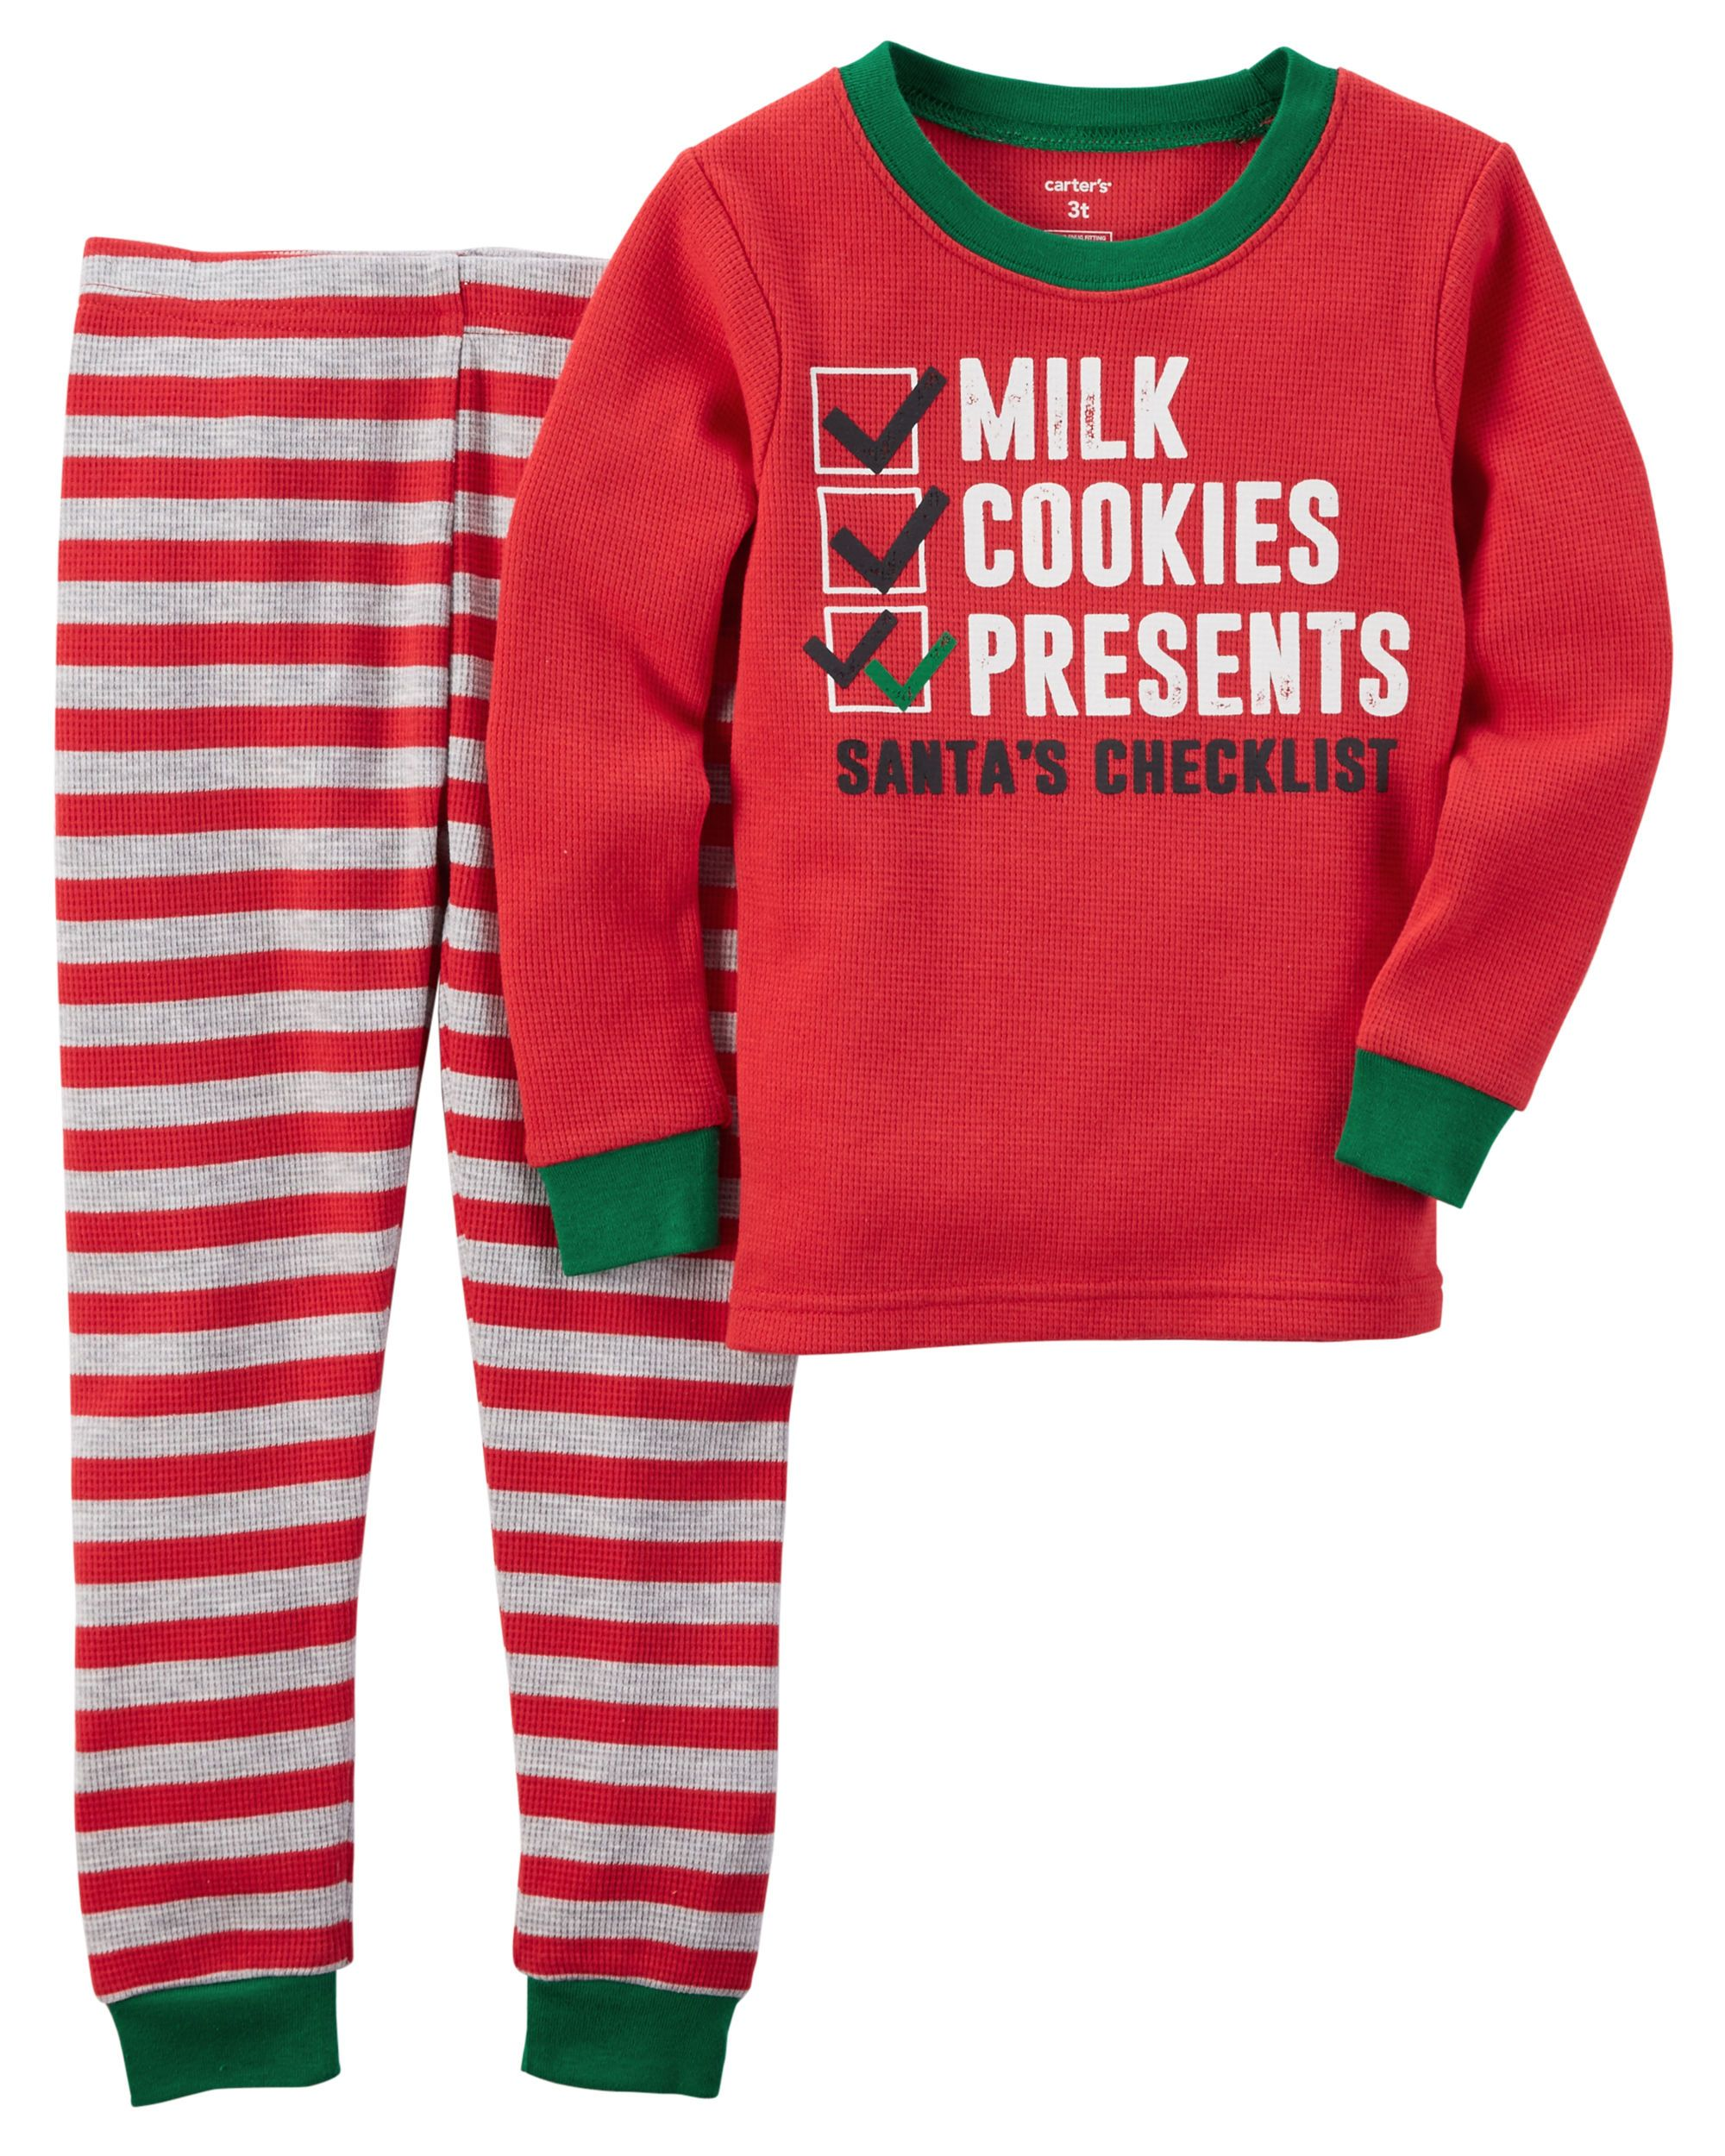 441a9495f Toddler Boy 2-Piece Snug Fit Cotton Christmas PJs